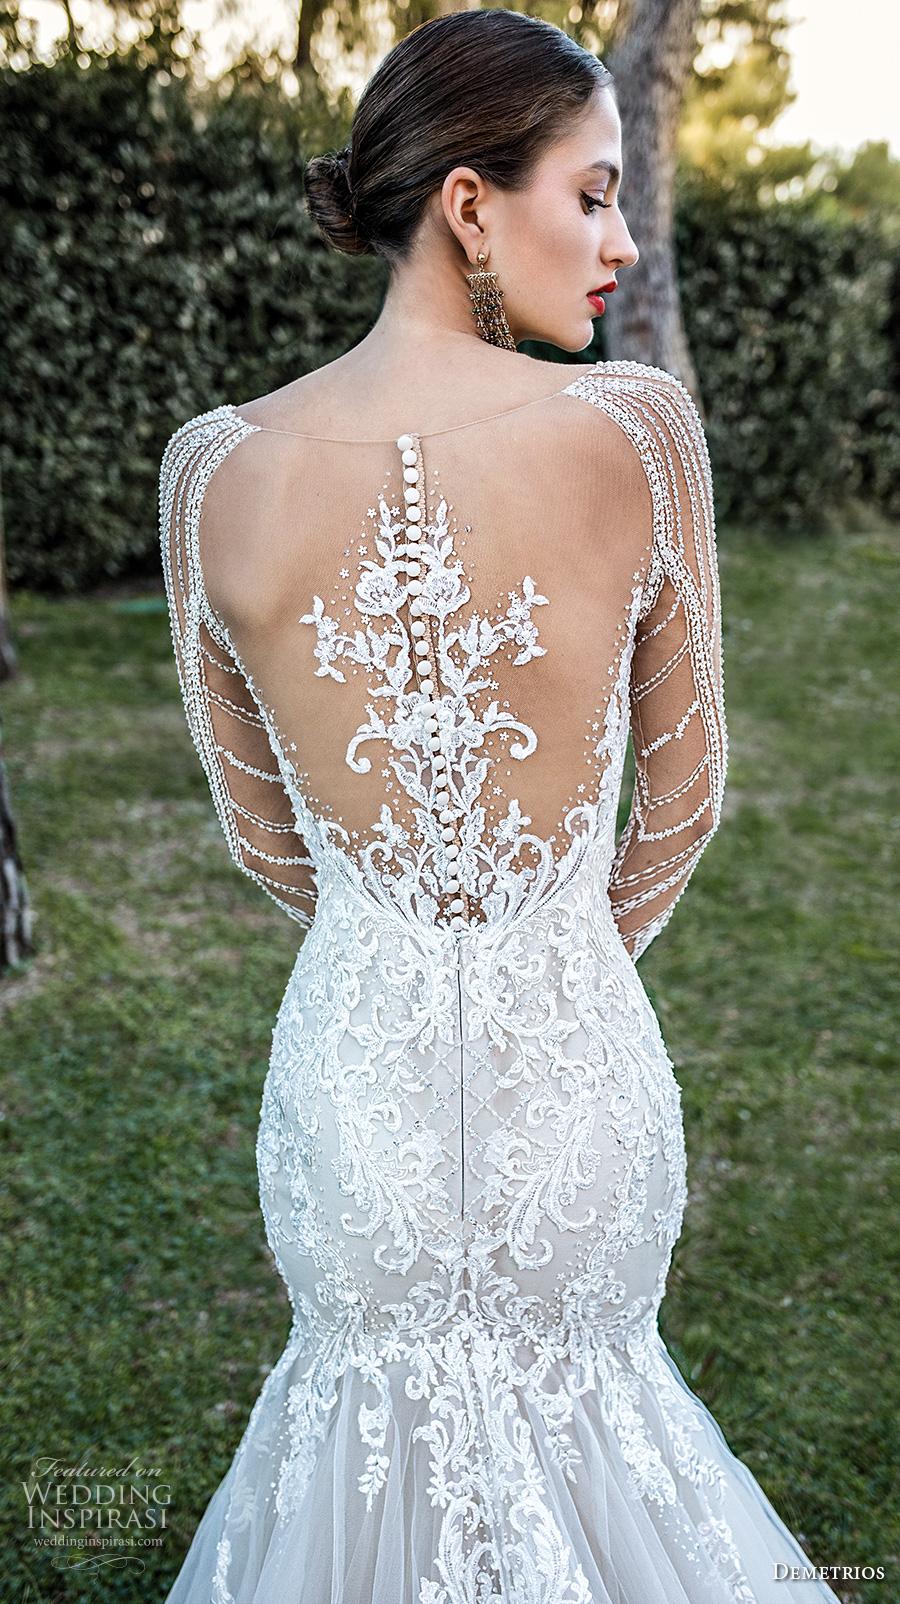 demetrios 2020 bridal long sleeves illusion bateau sweetheart neckline heavily embellished bodice elegant mermaid wedding dress sheer lace back chapel train (8) zbv